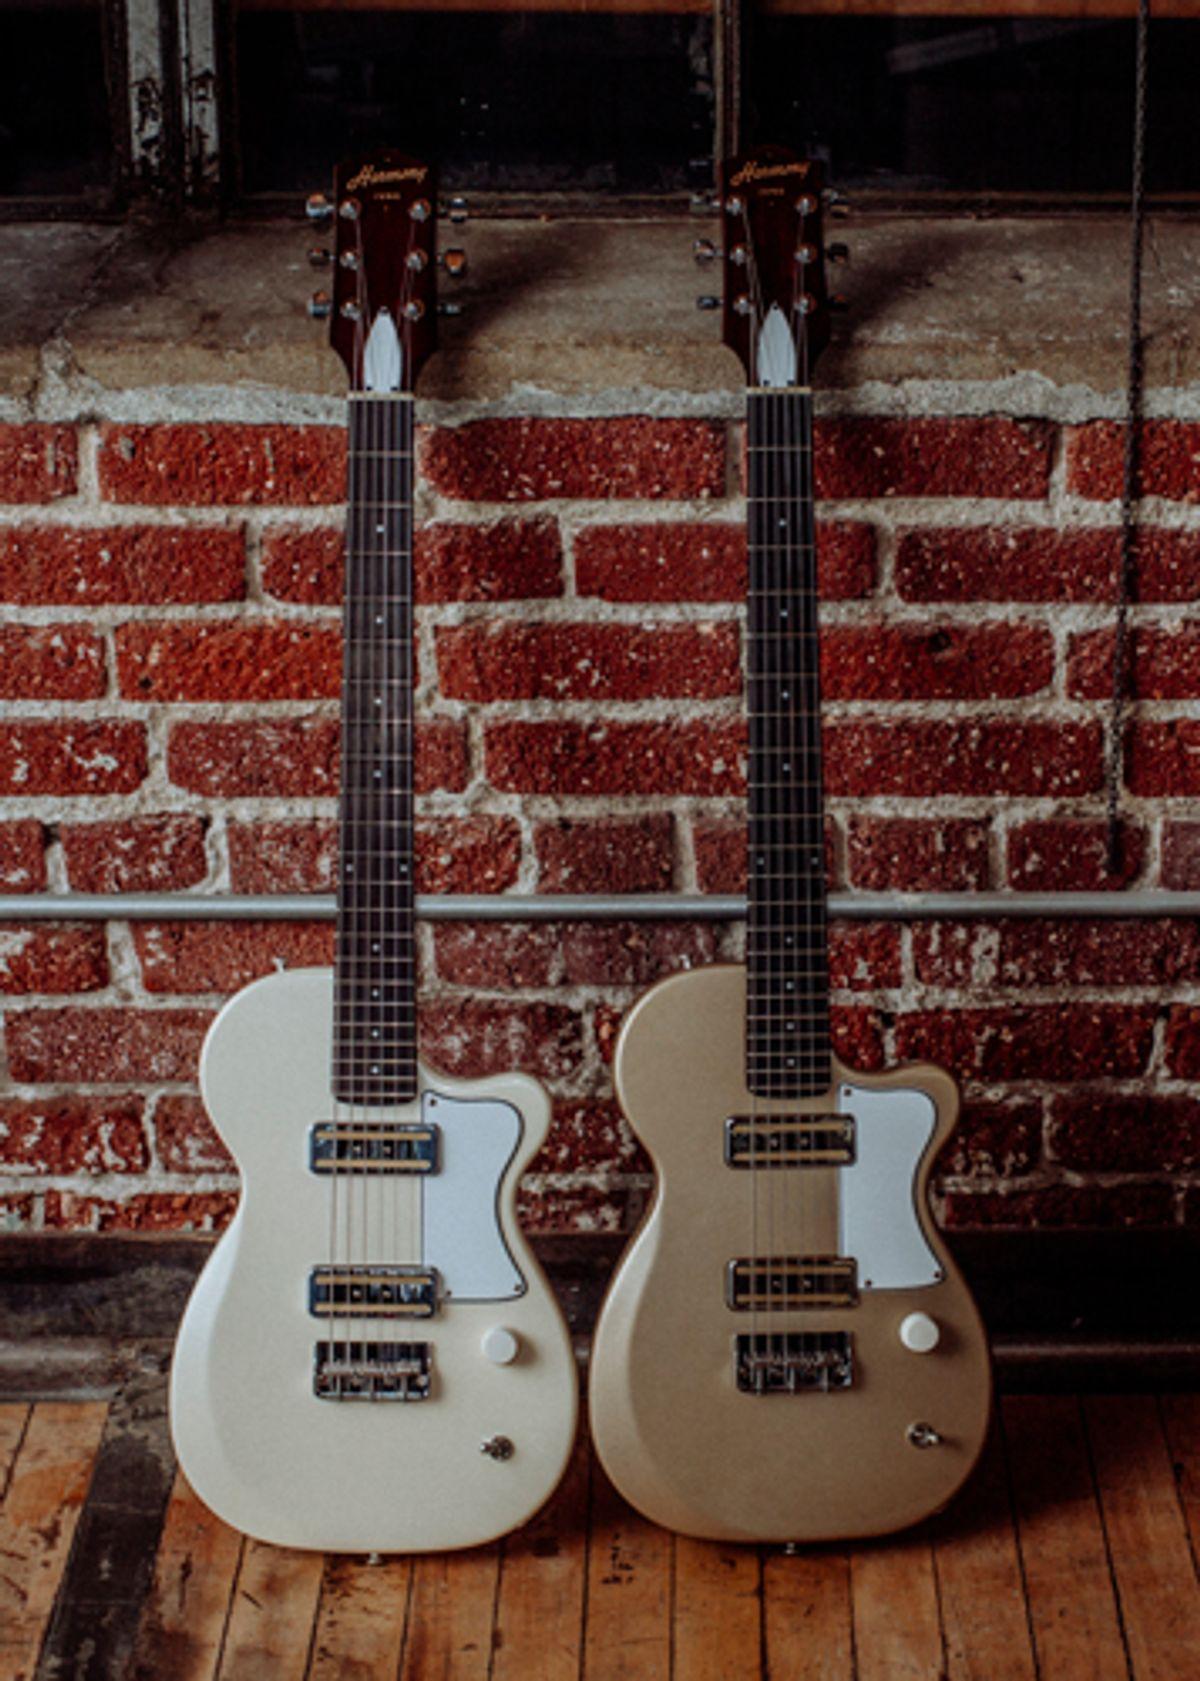 Harmony Guitars Launches the Juno